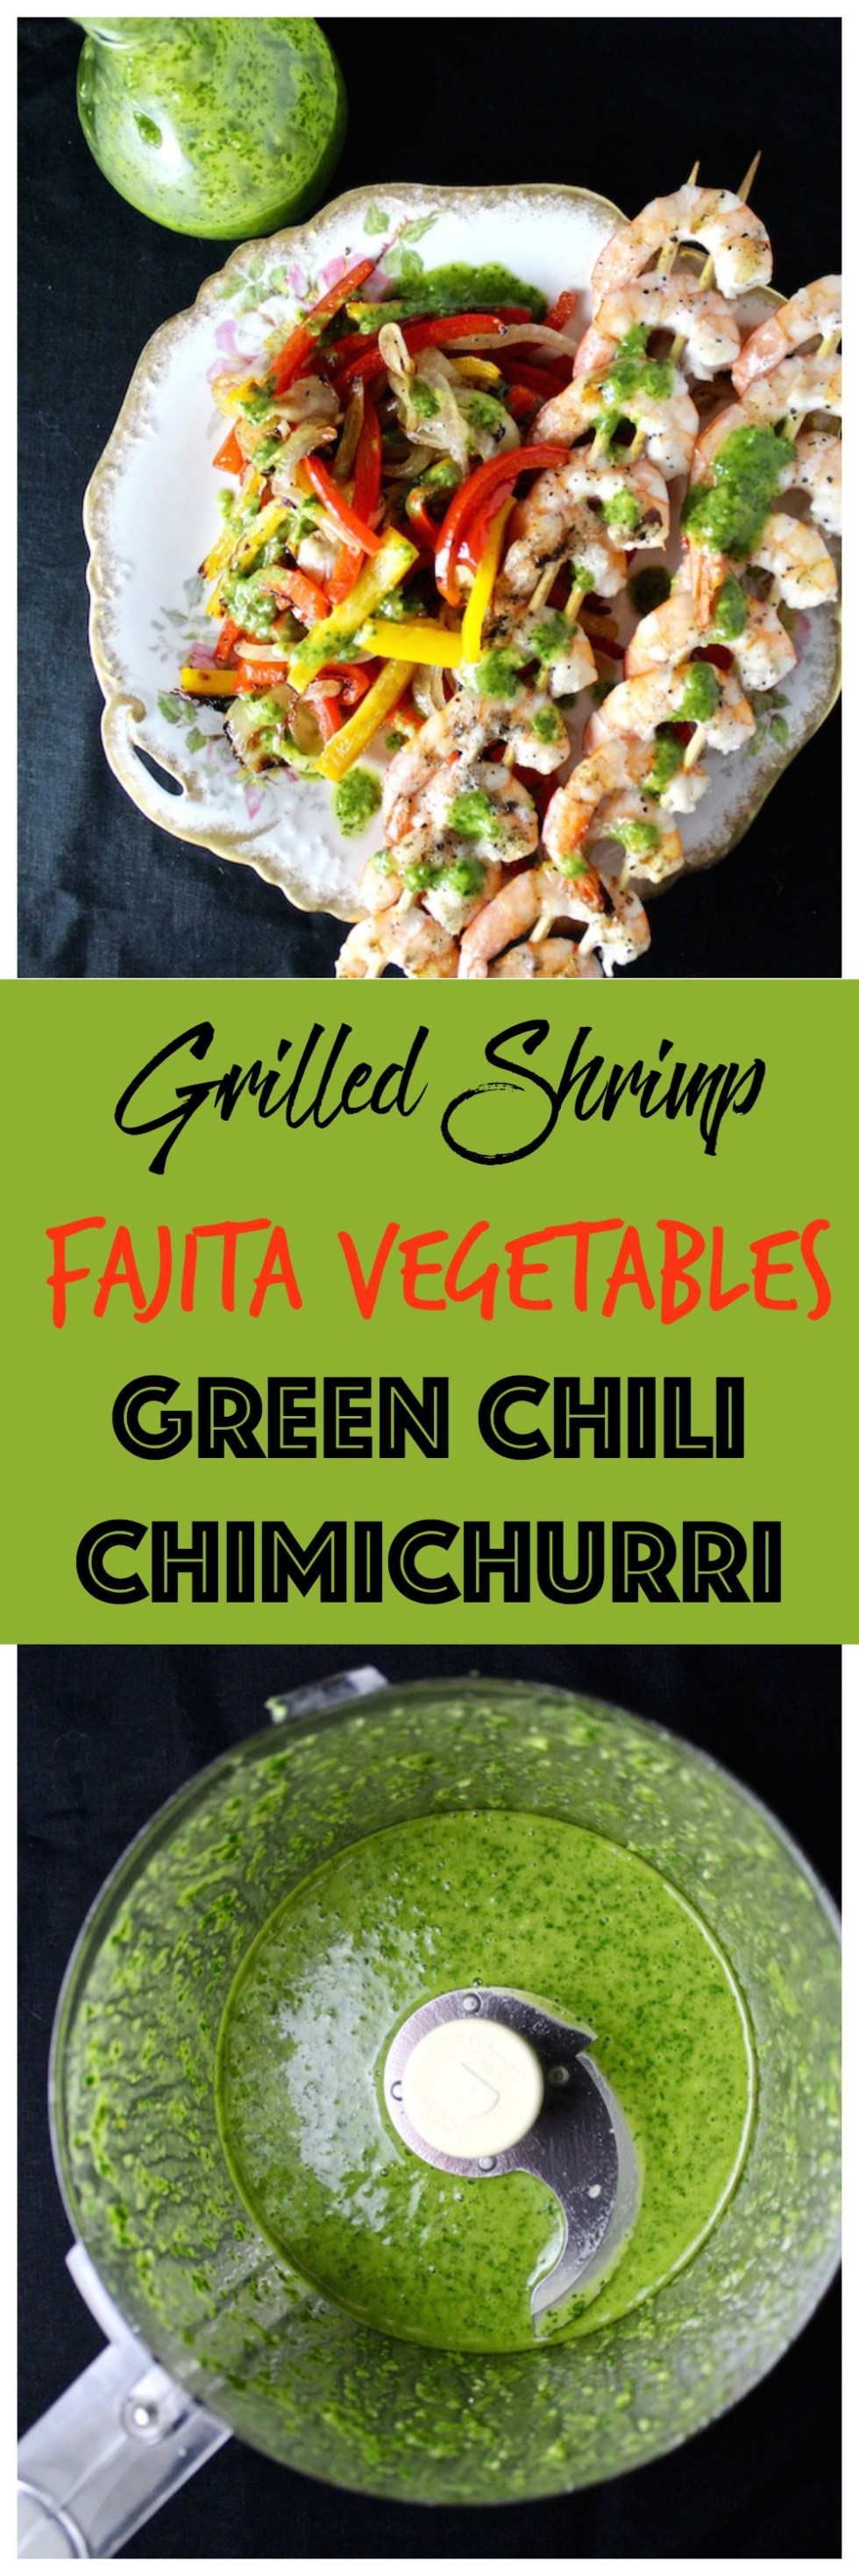 grilled shrimp fajita vegetables chimichurri pinterest